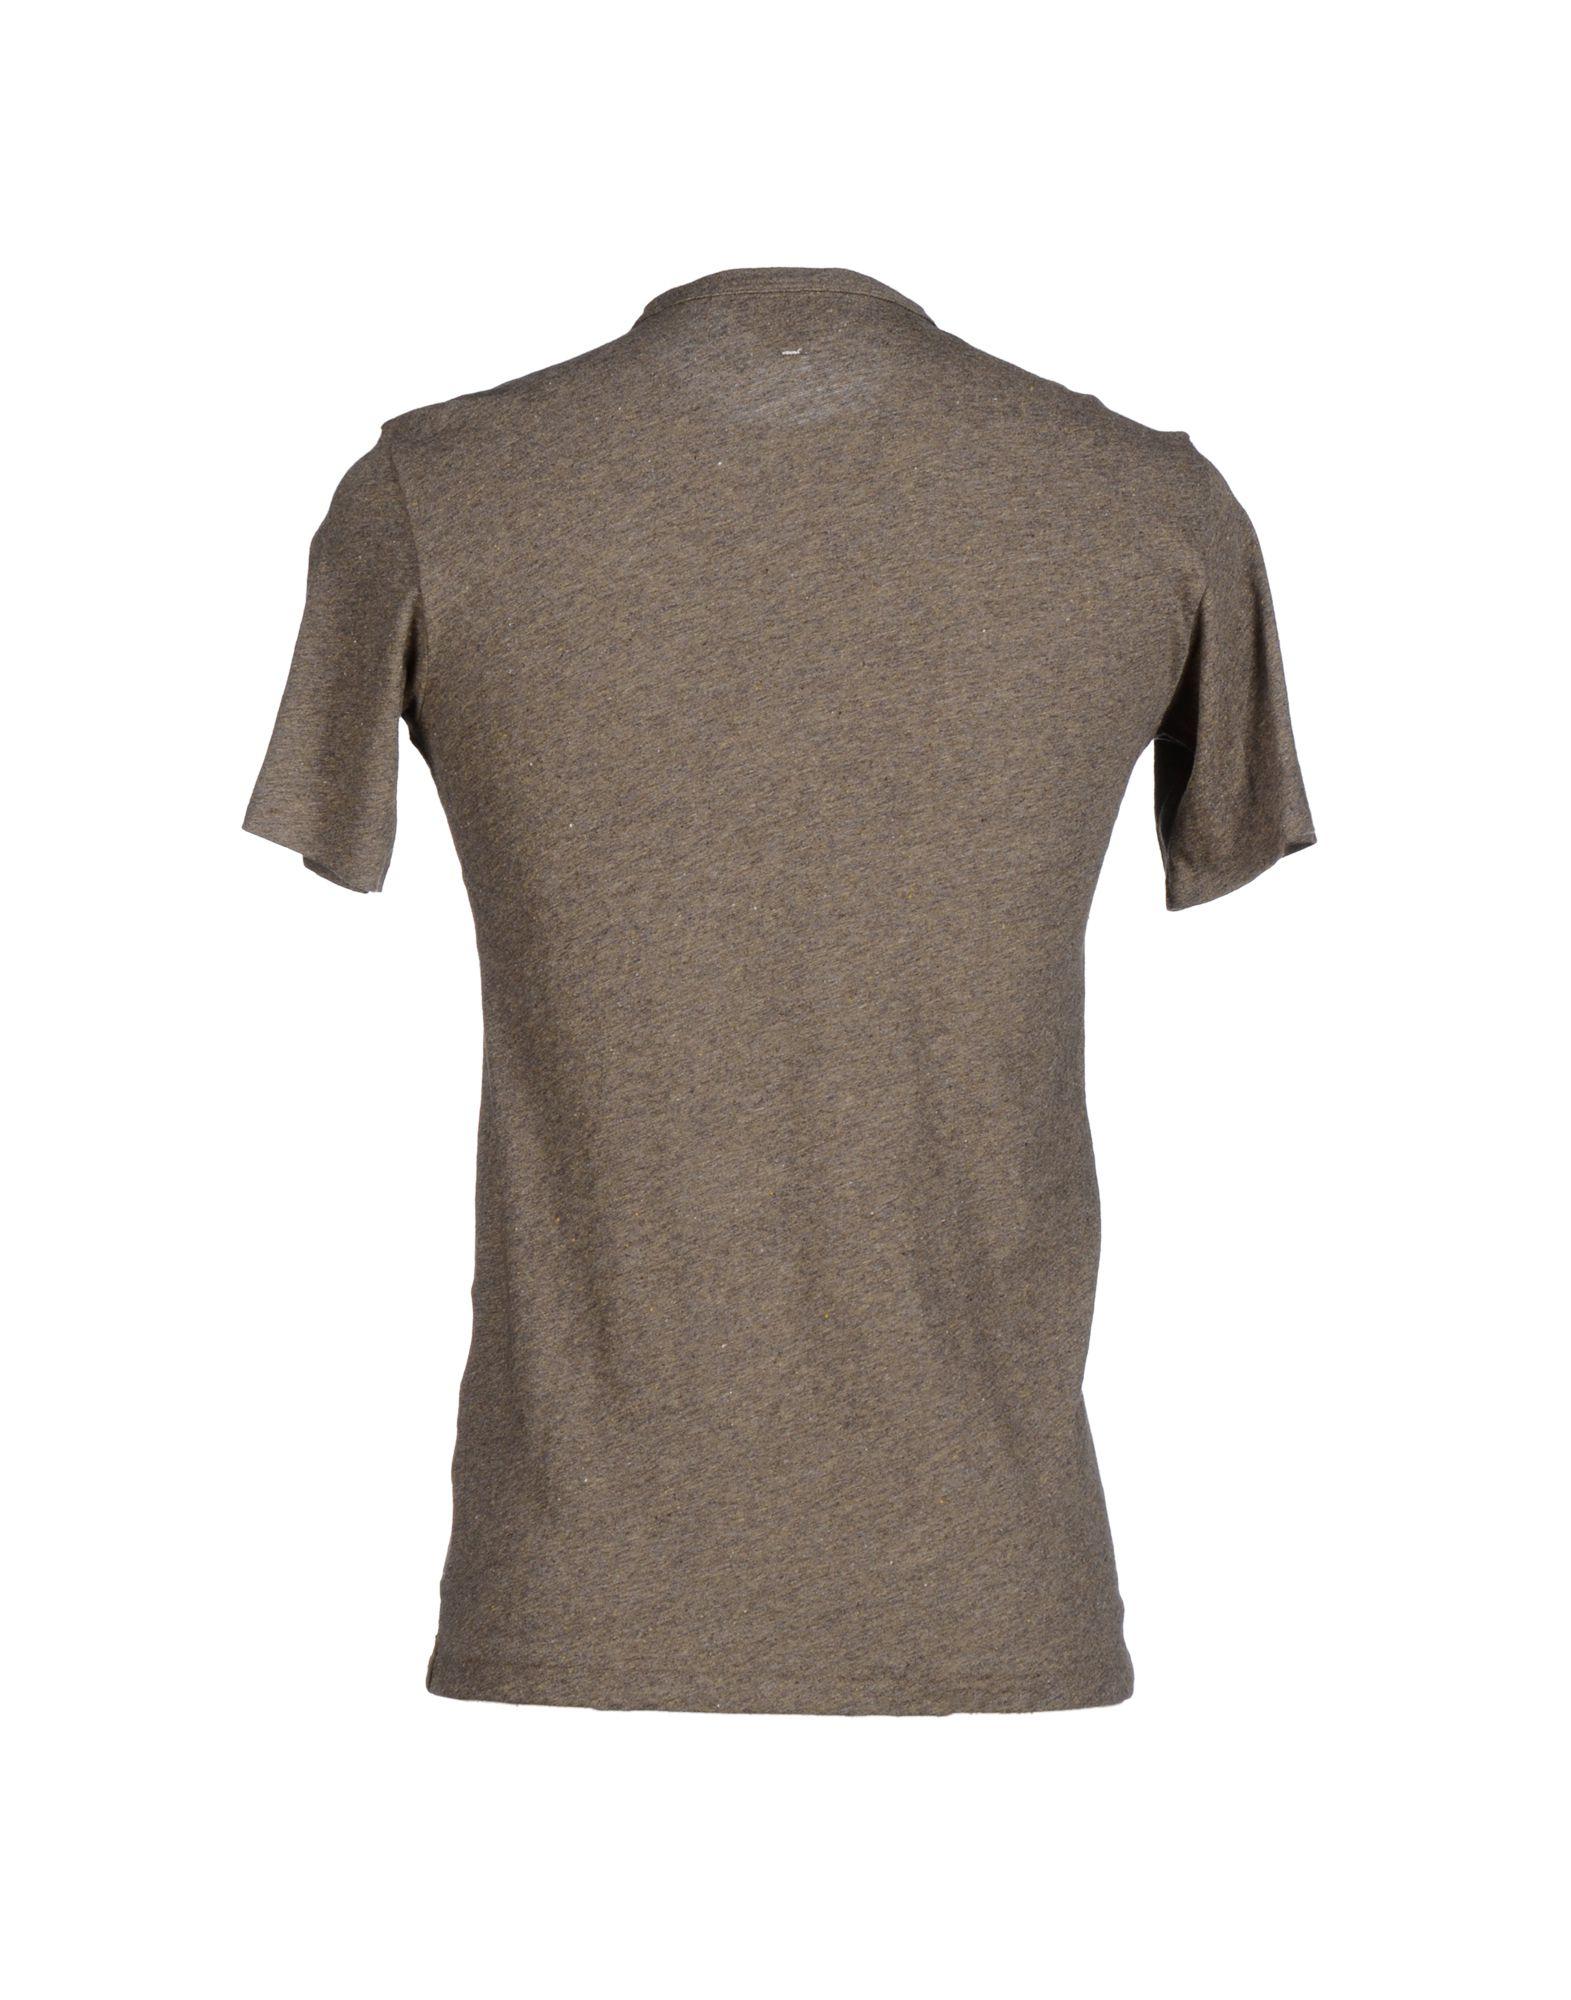 Rag bone t shirt in natural for men khaki save 6 lyst for Rag and bone t shirts